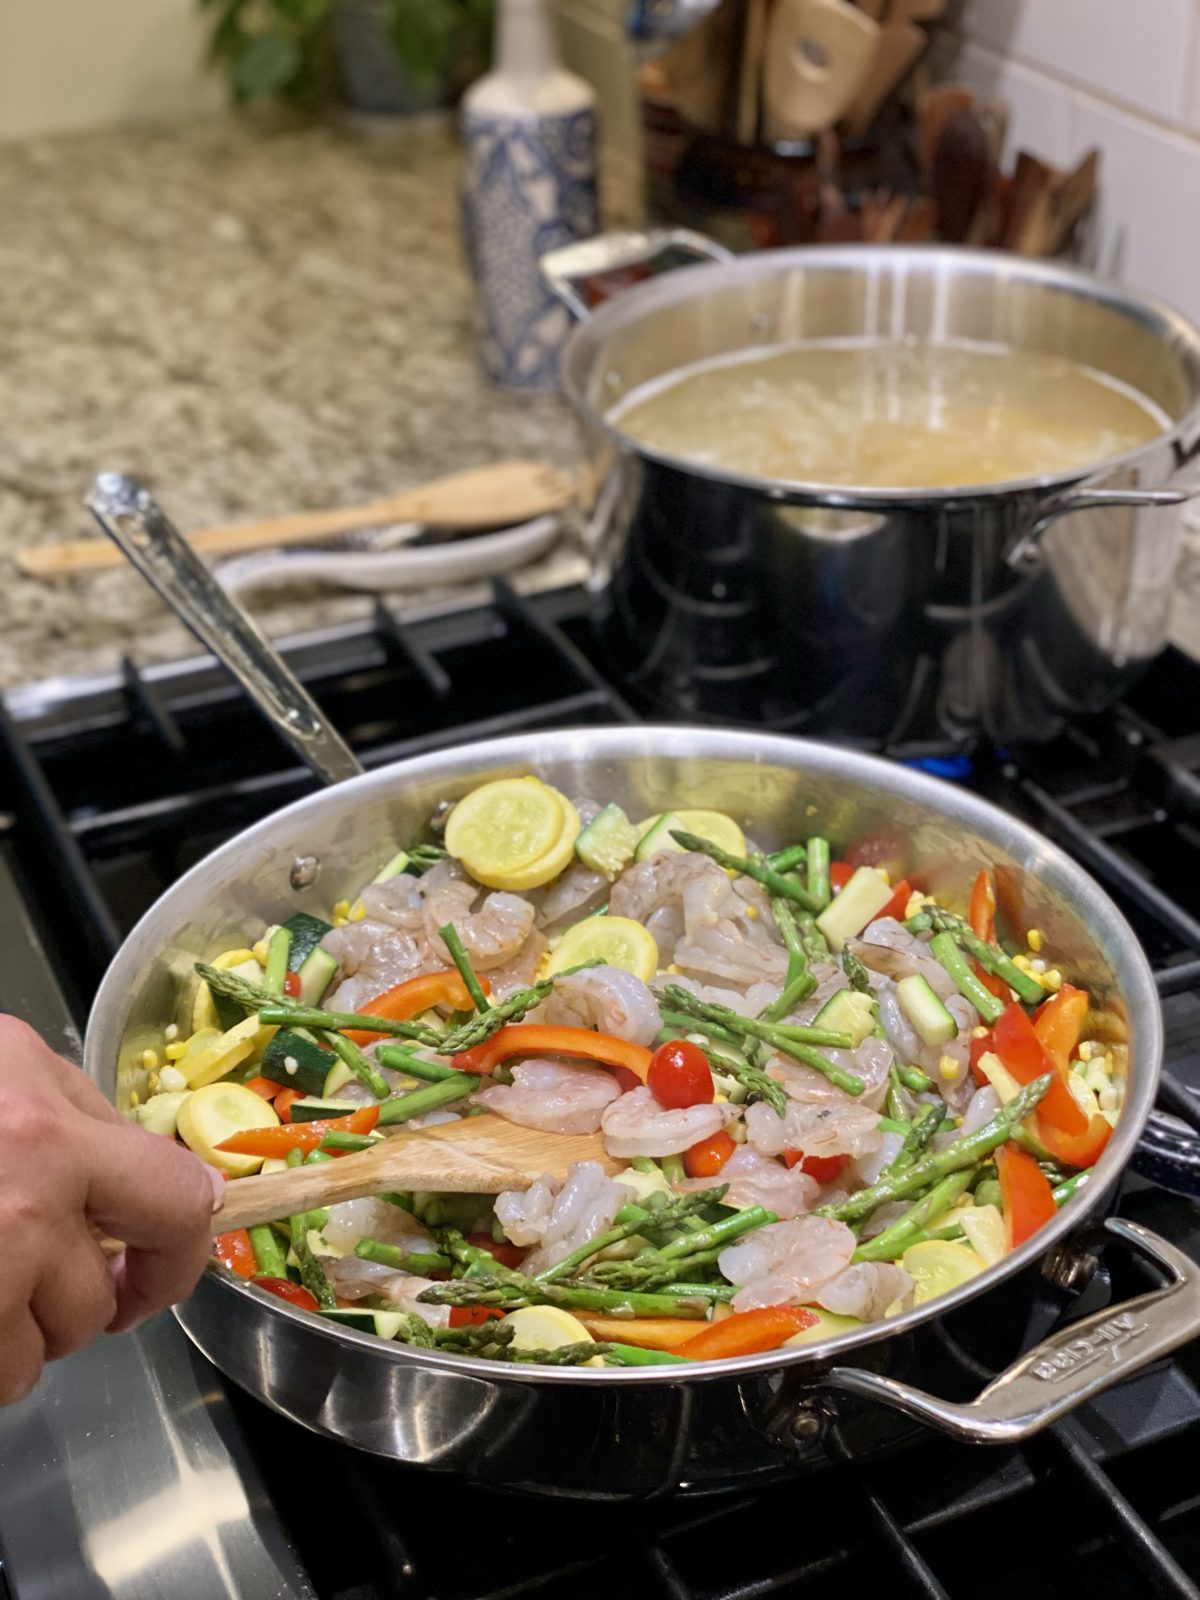 Large skillet with sautéed shrimp & summer veggies